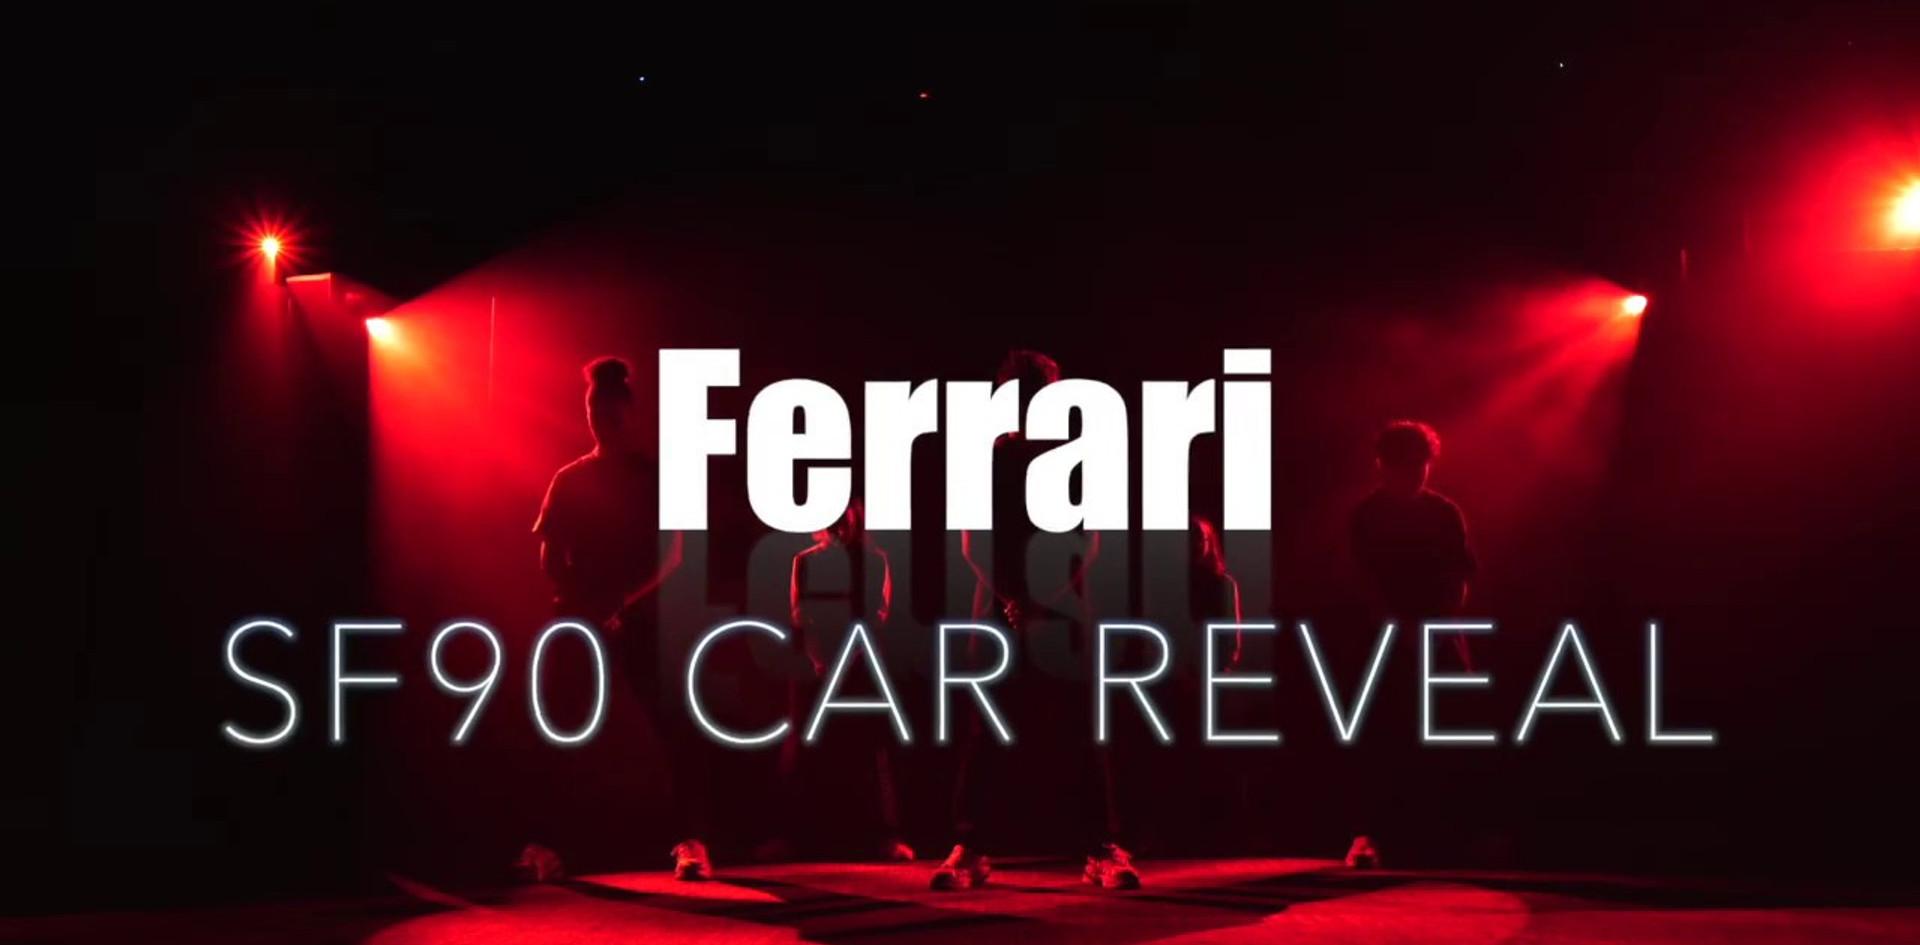 FERRARI SF90 CAR REVEAL